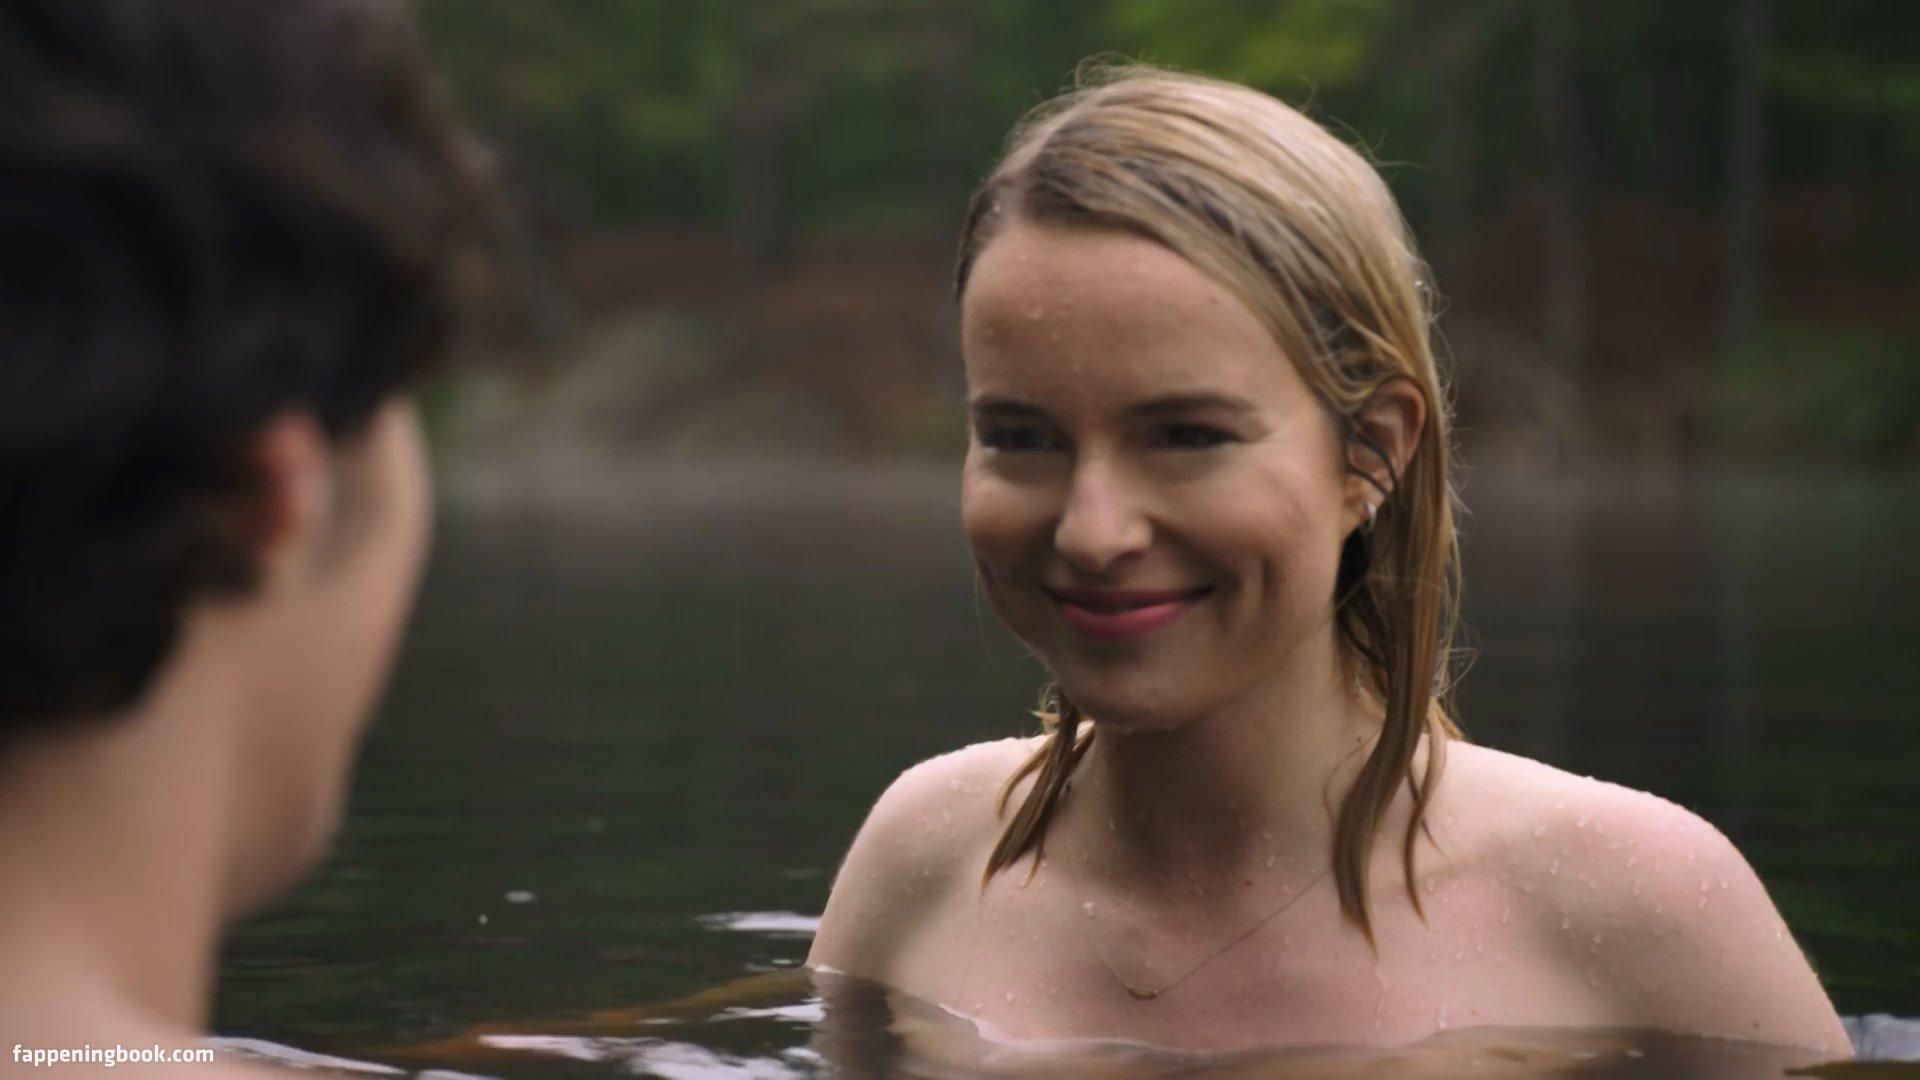 Bridgit Mendler Naked bridgit mendler nude, sexy, the fappening, uncensored